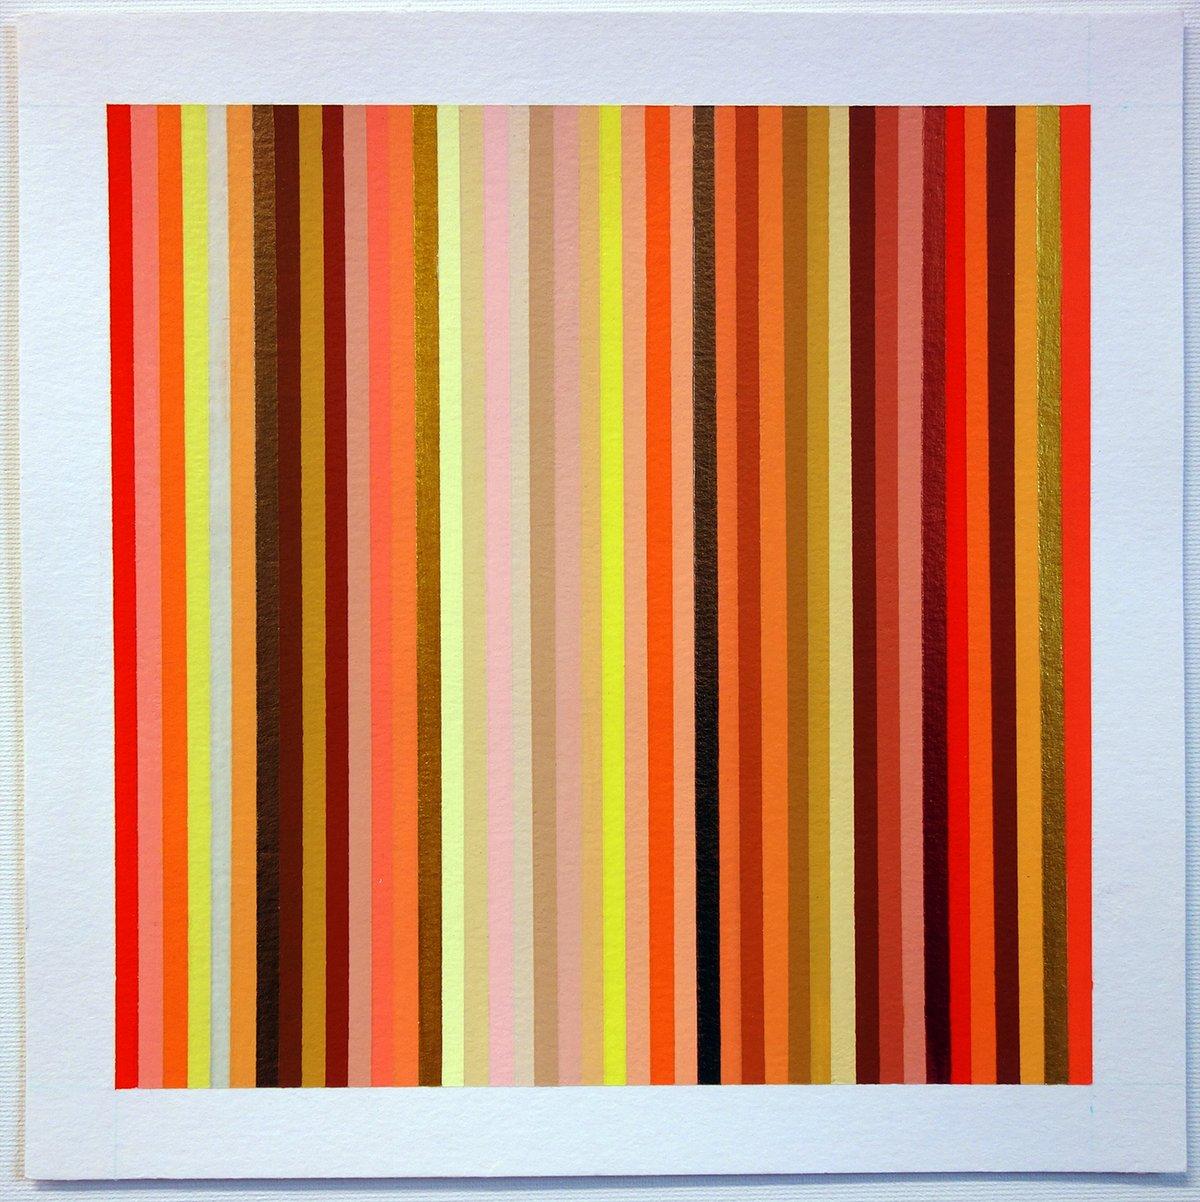 Image of 42 Shades orange, yellow and gold